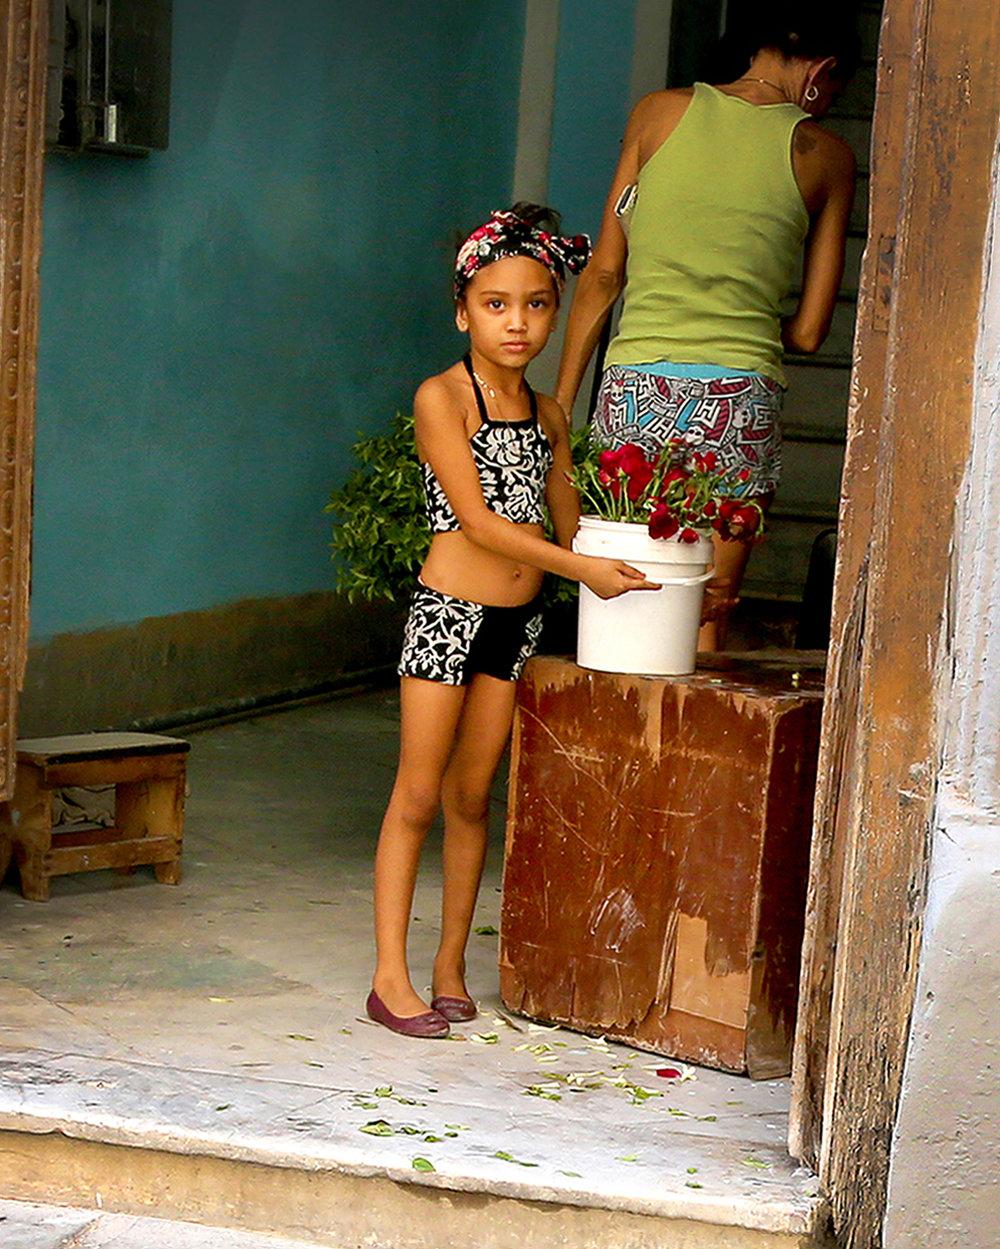 7W1A0254_cuba_girl_ritathompson_crop2.jpg